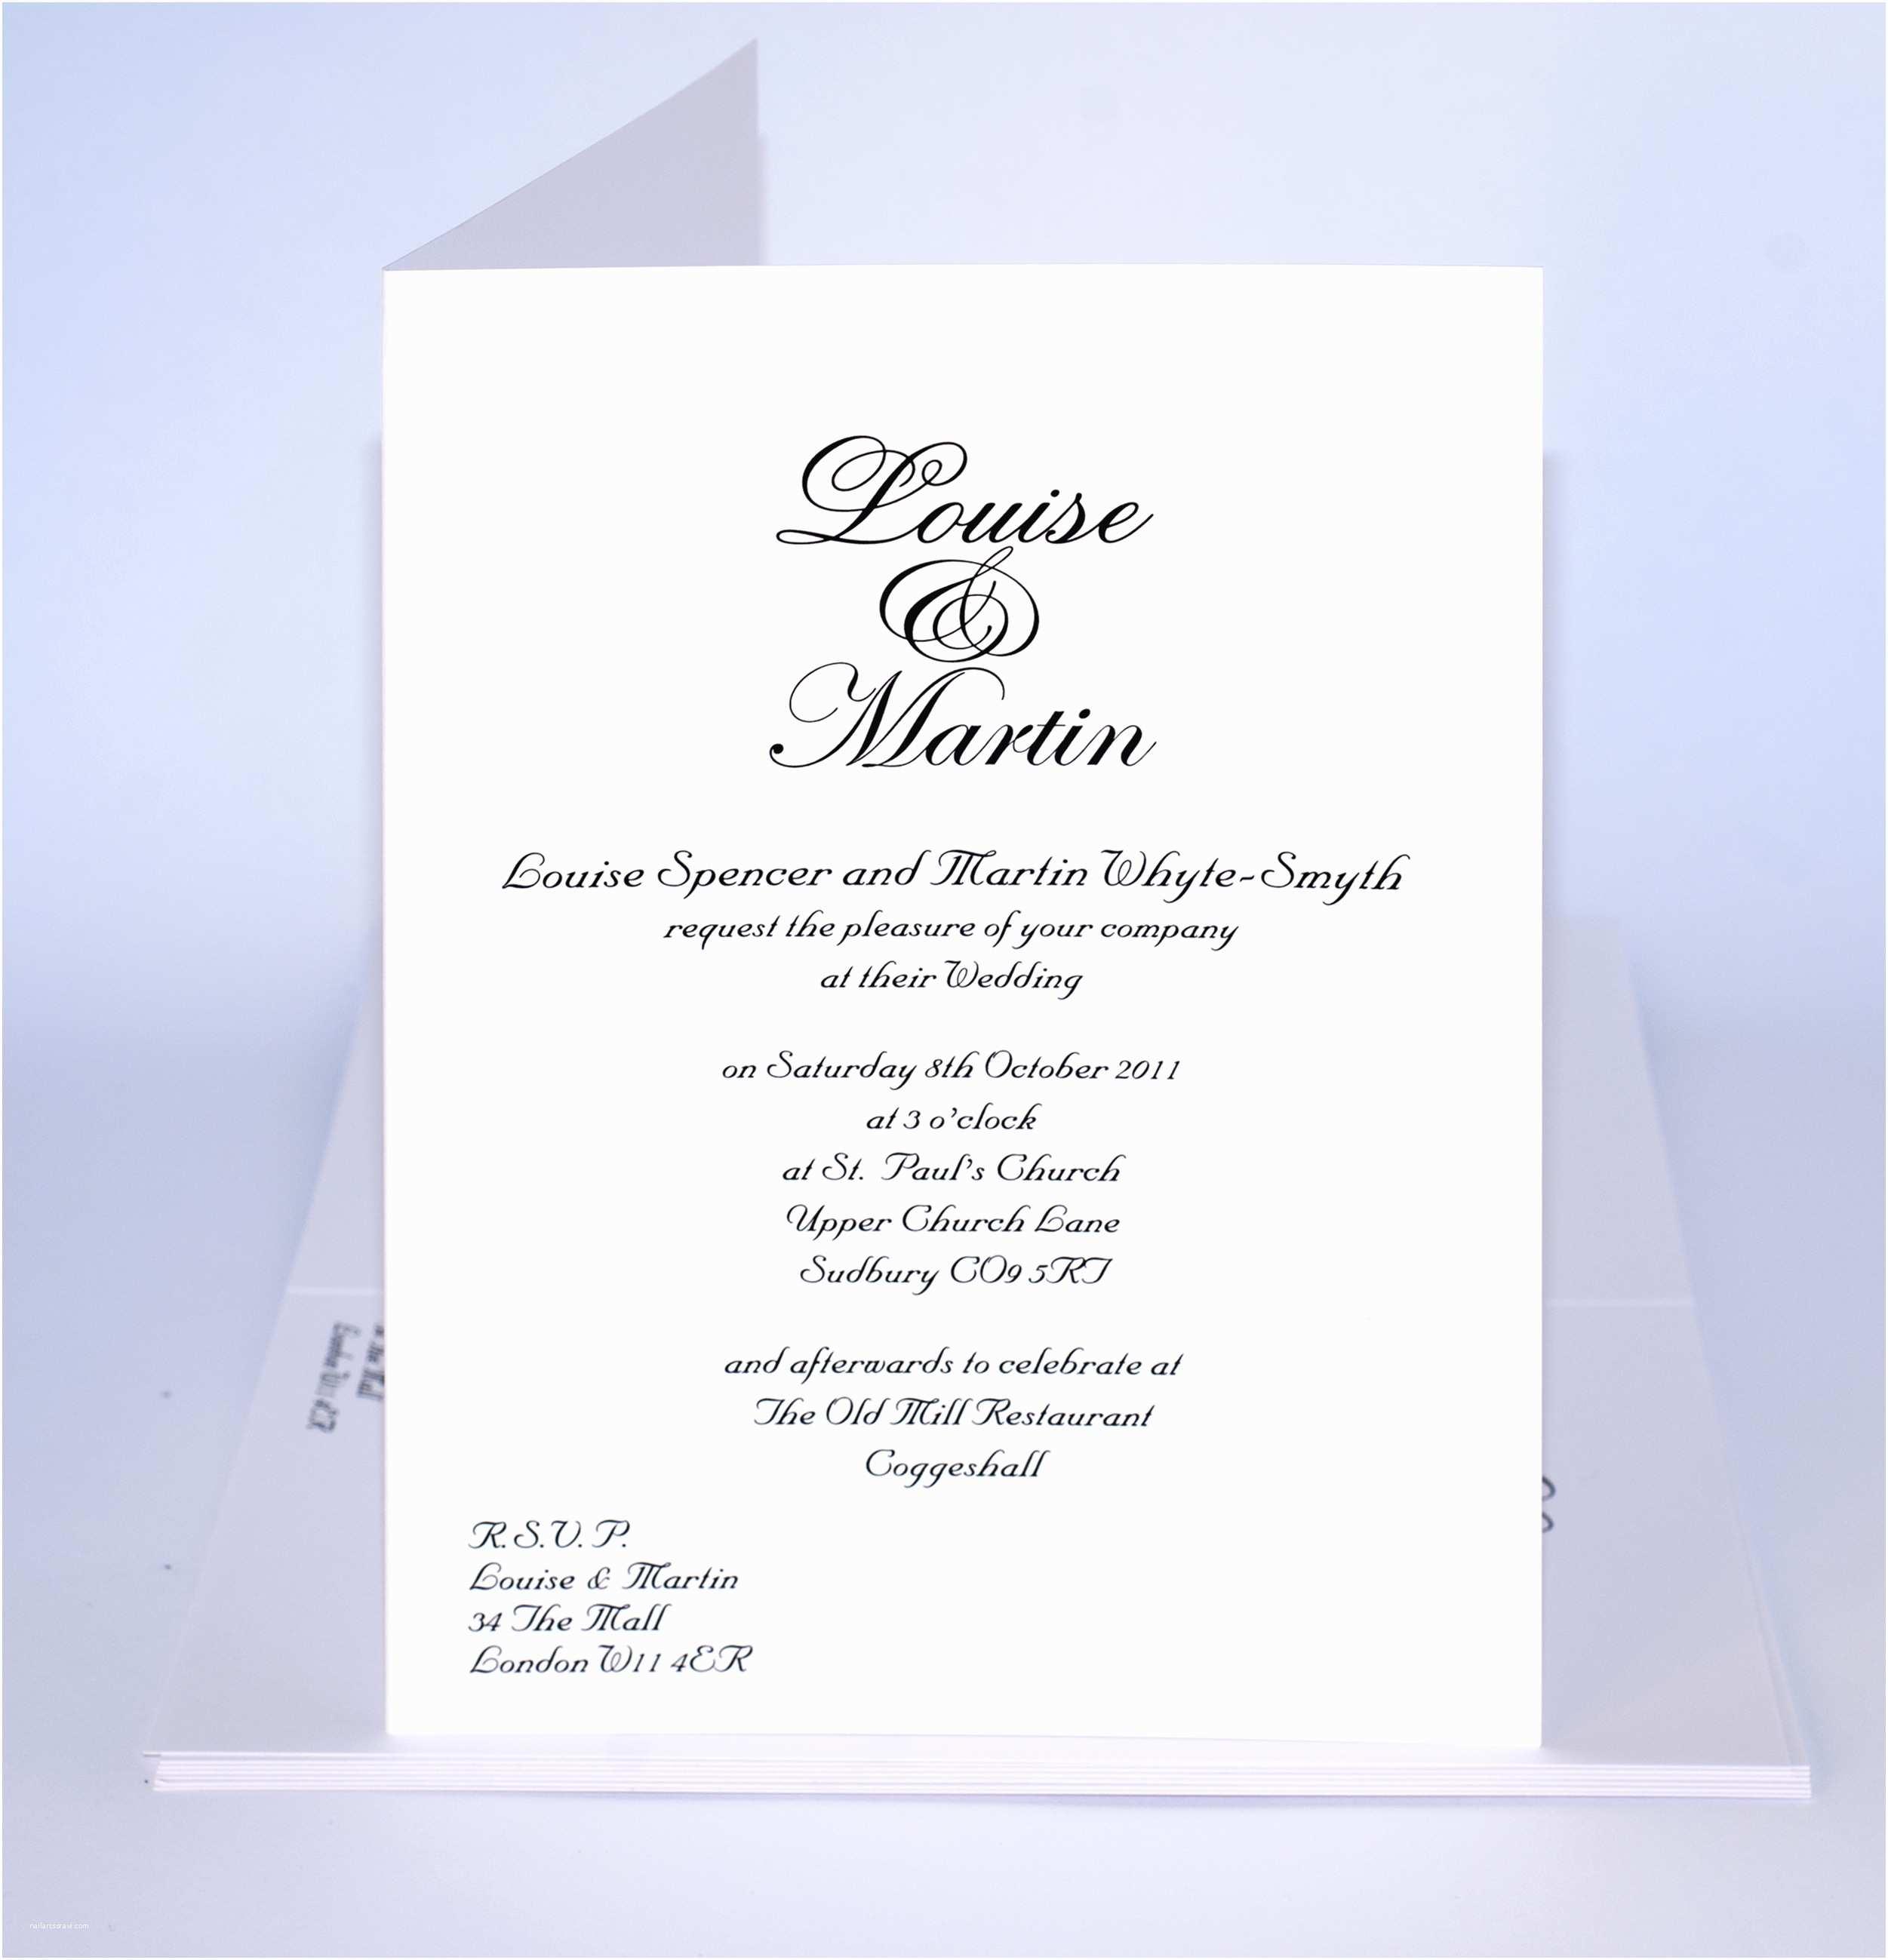 Samples Of Wedding Invitations Wedding Invitation Wording Wedding Invitation Templates